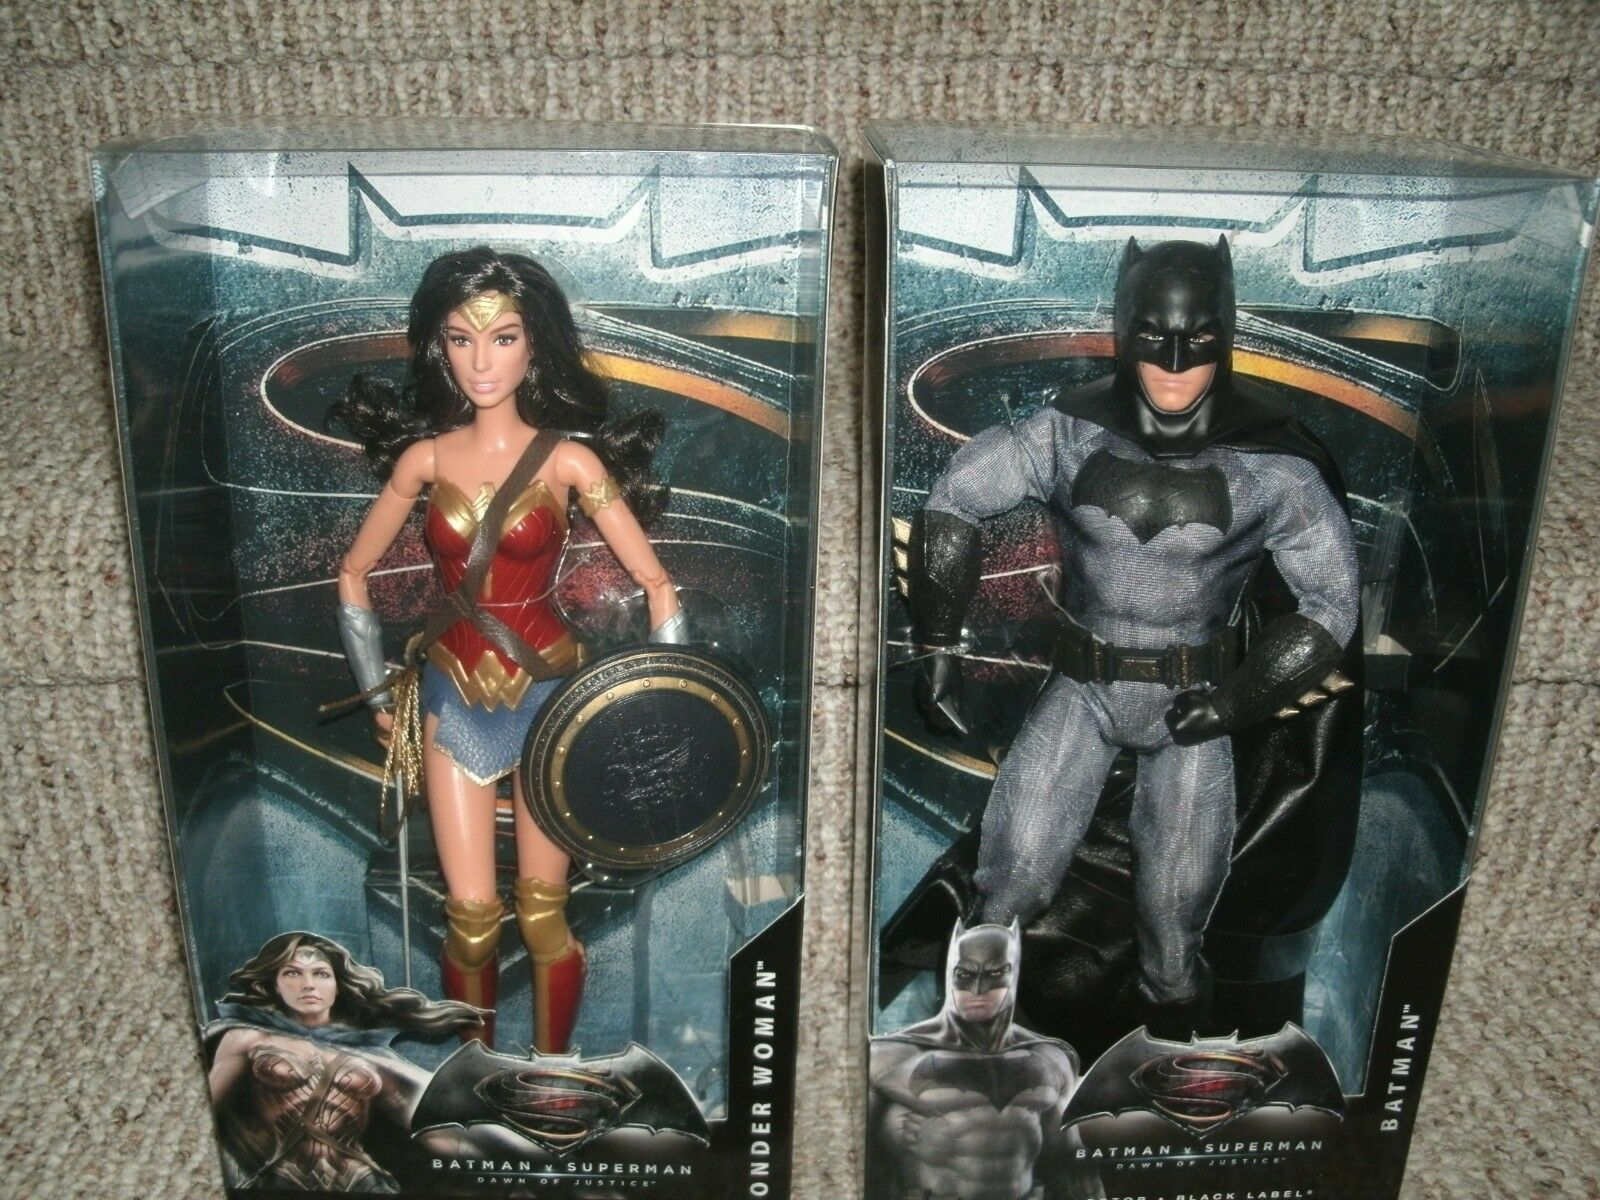 Wonder Woman & Batman Dawn of Justice Mattel Barbie schwarz label dolls NIP